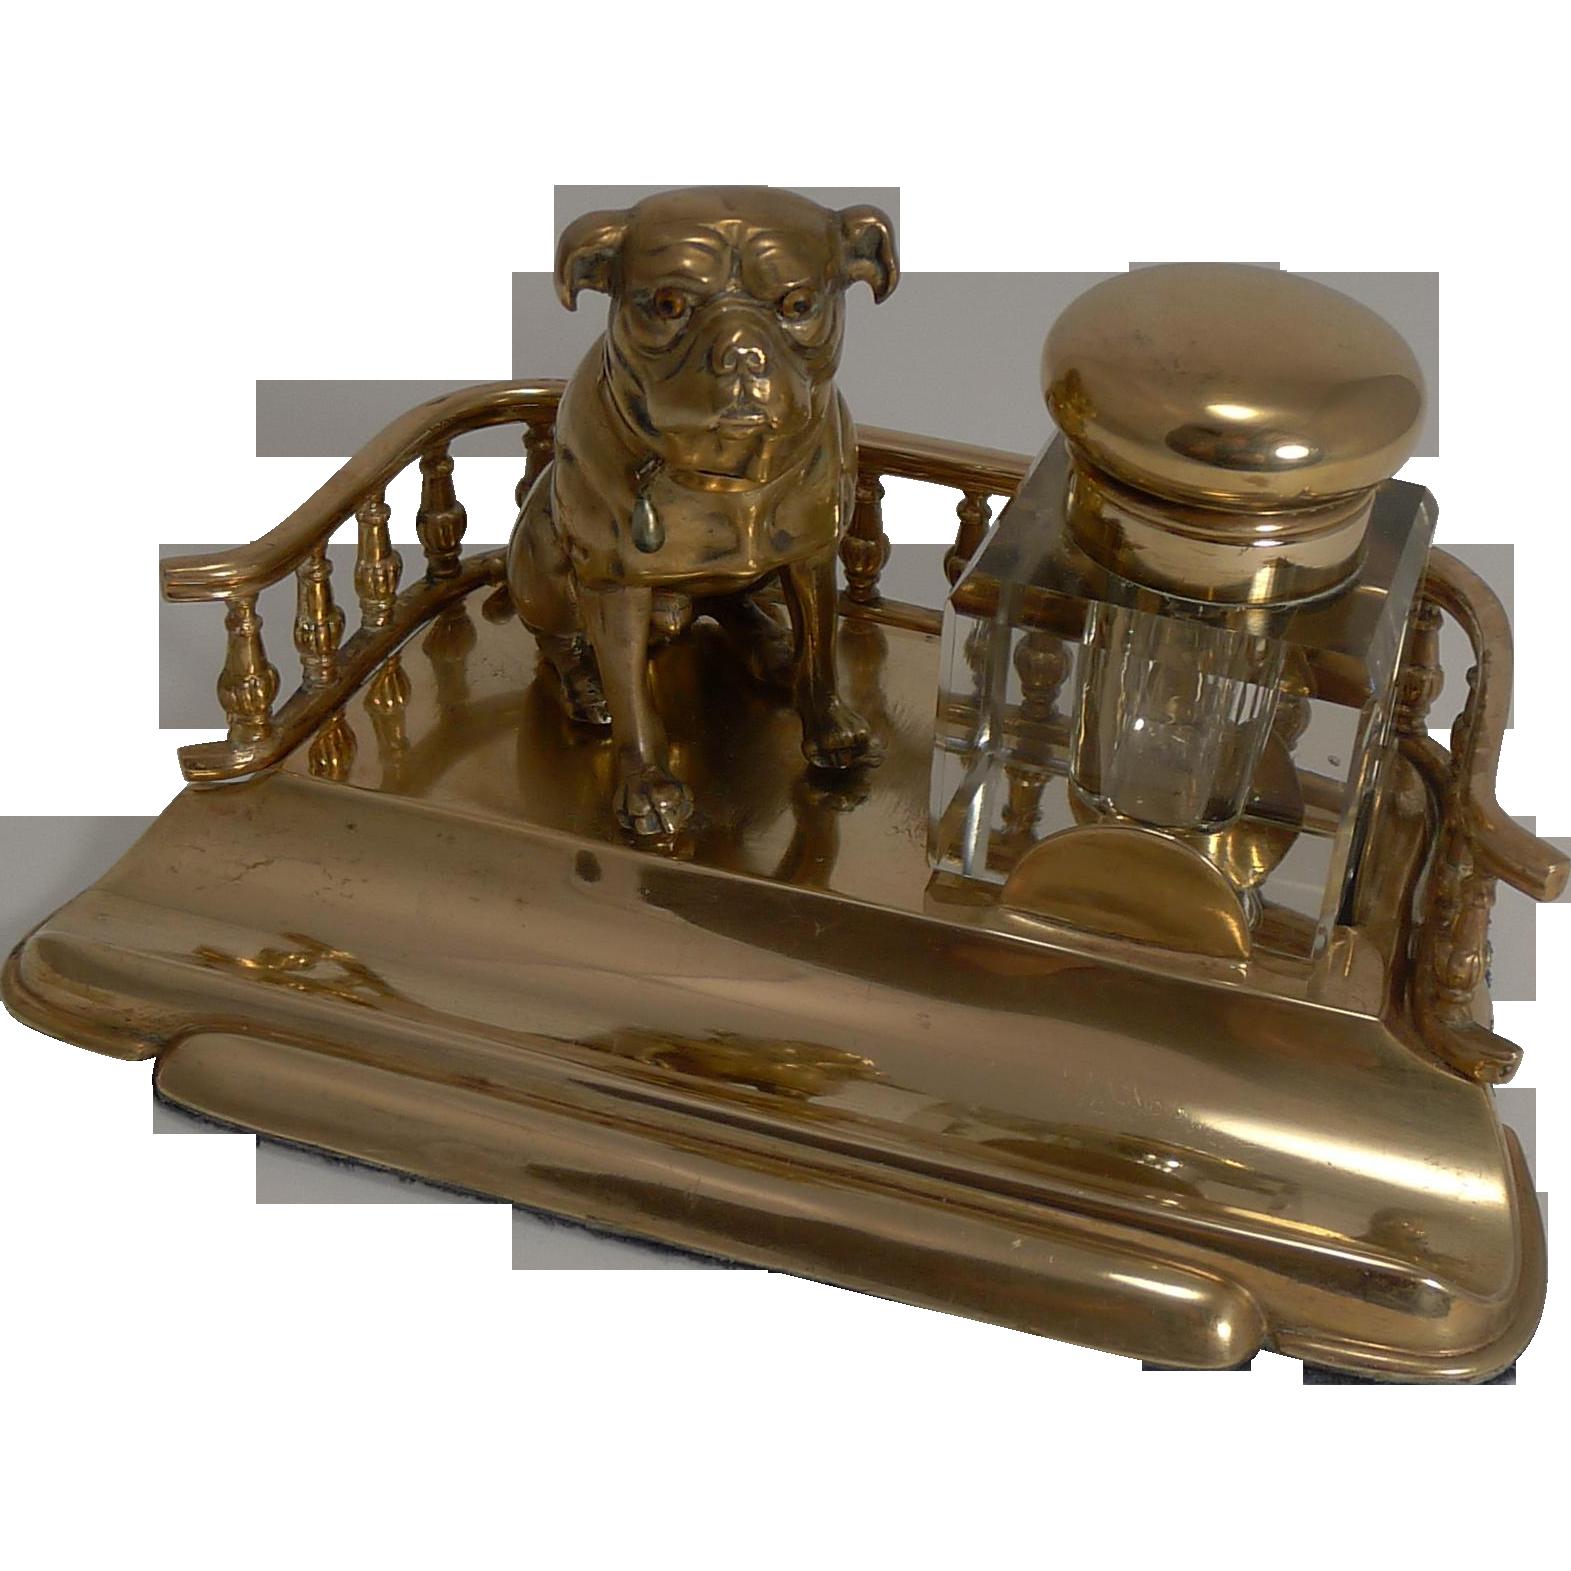 Antique English Handsome Dog Inkwell - English Bulldog c.1890